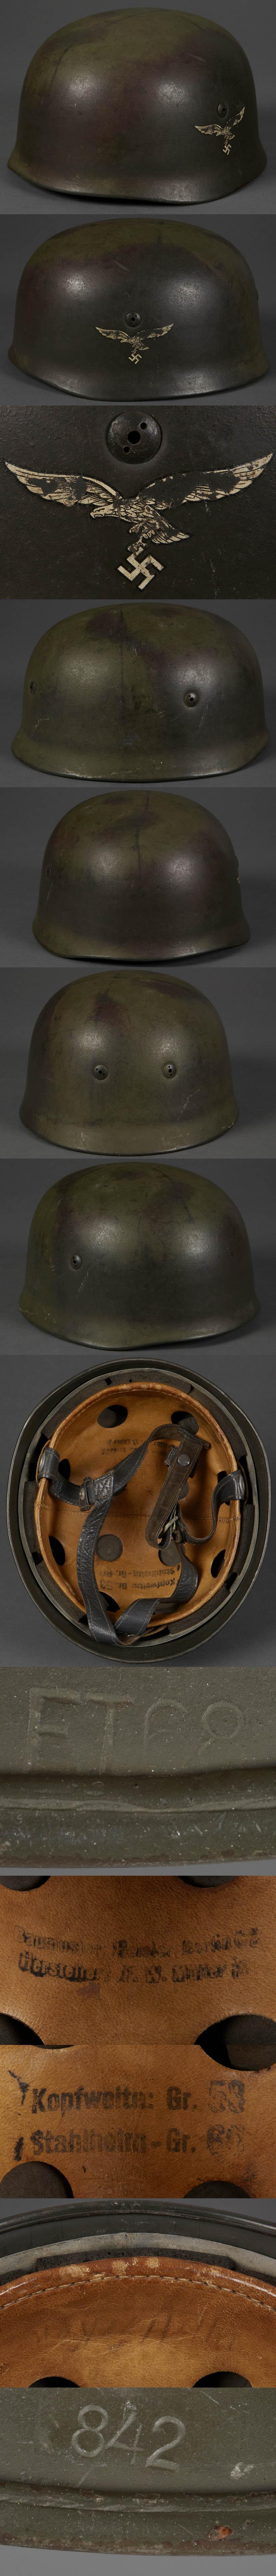 M38 Paratrooper SD Camouflage Helmet